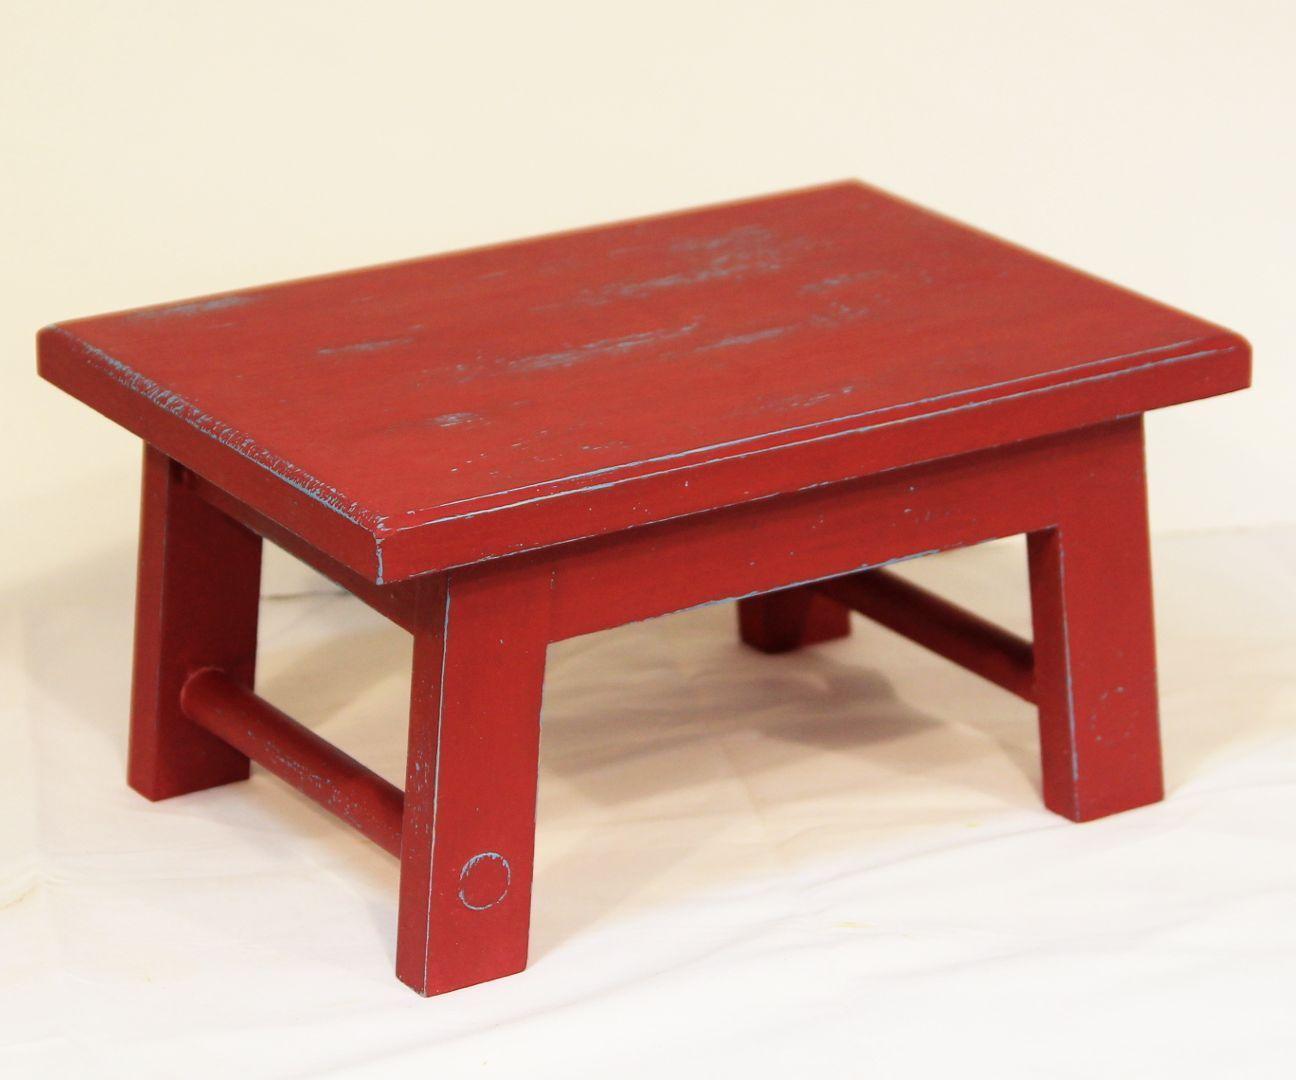 Marvelous Diy Building A Small Step Stool Lego Bathroom For Boys Beatyapartments Chair Design Images Beatyapartmentscom